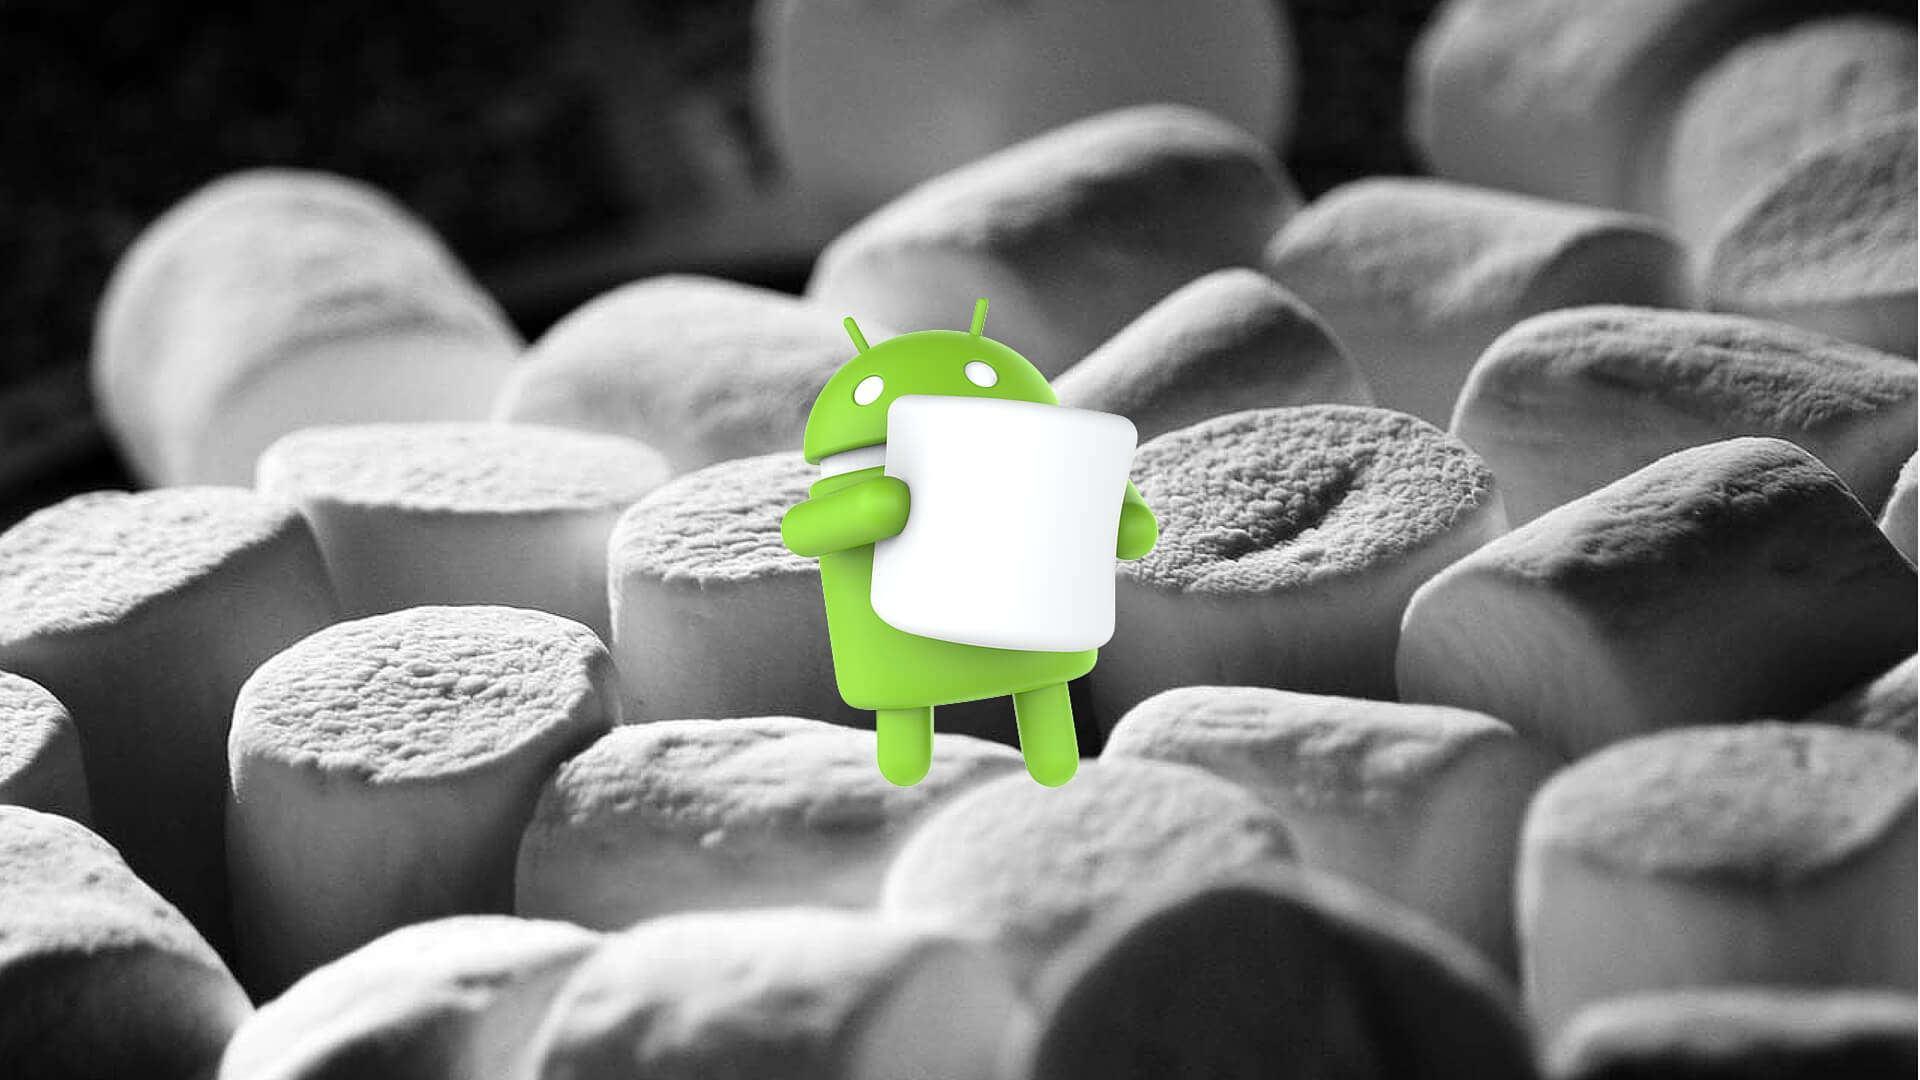 Sony springt mit Xperia Beta-Programm auf Android Marshmallow-Zug auf